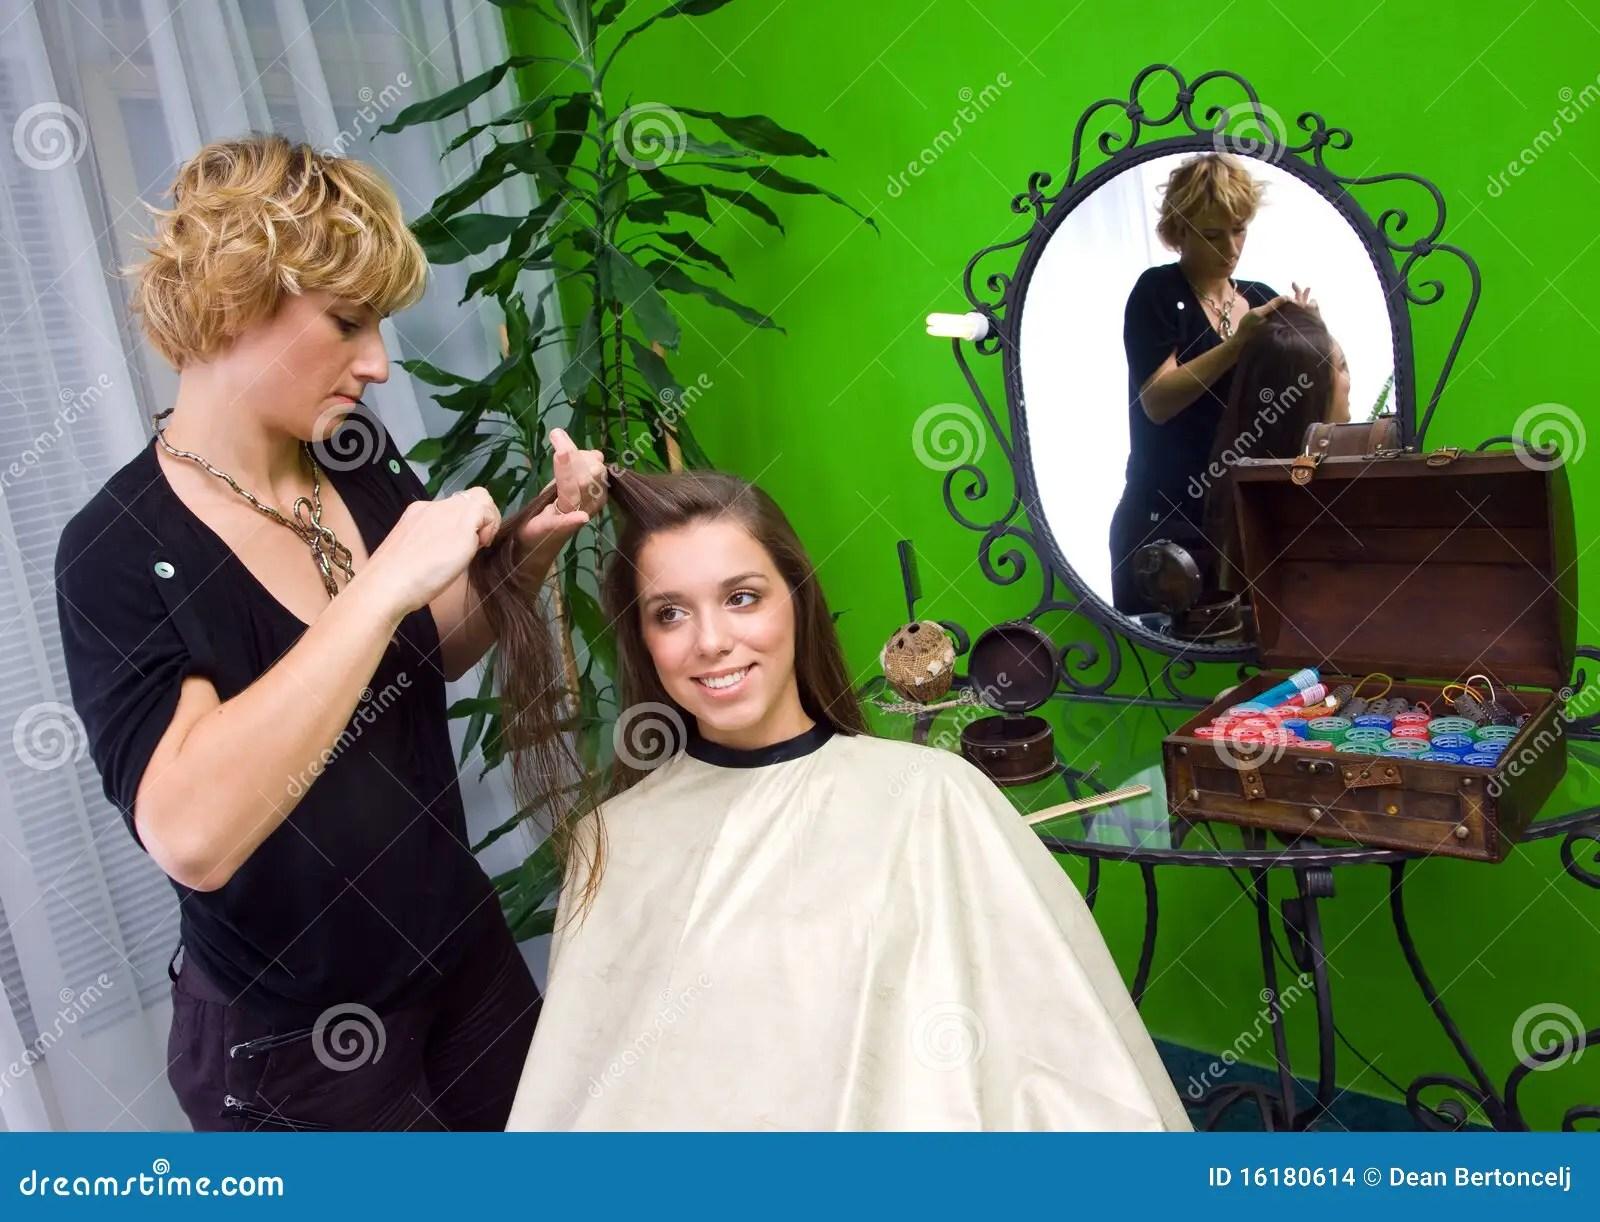 Working Scene From Hair Salon Stock Photo  Image 16180614